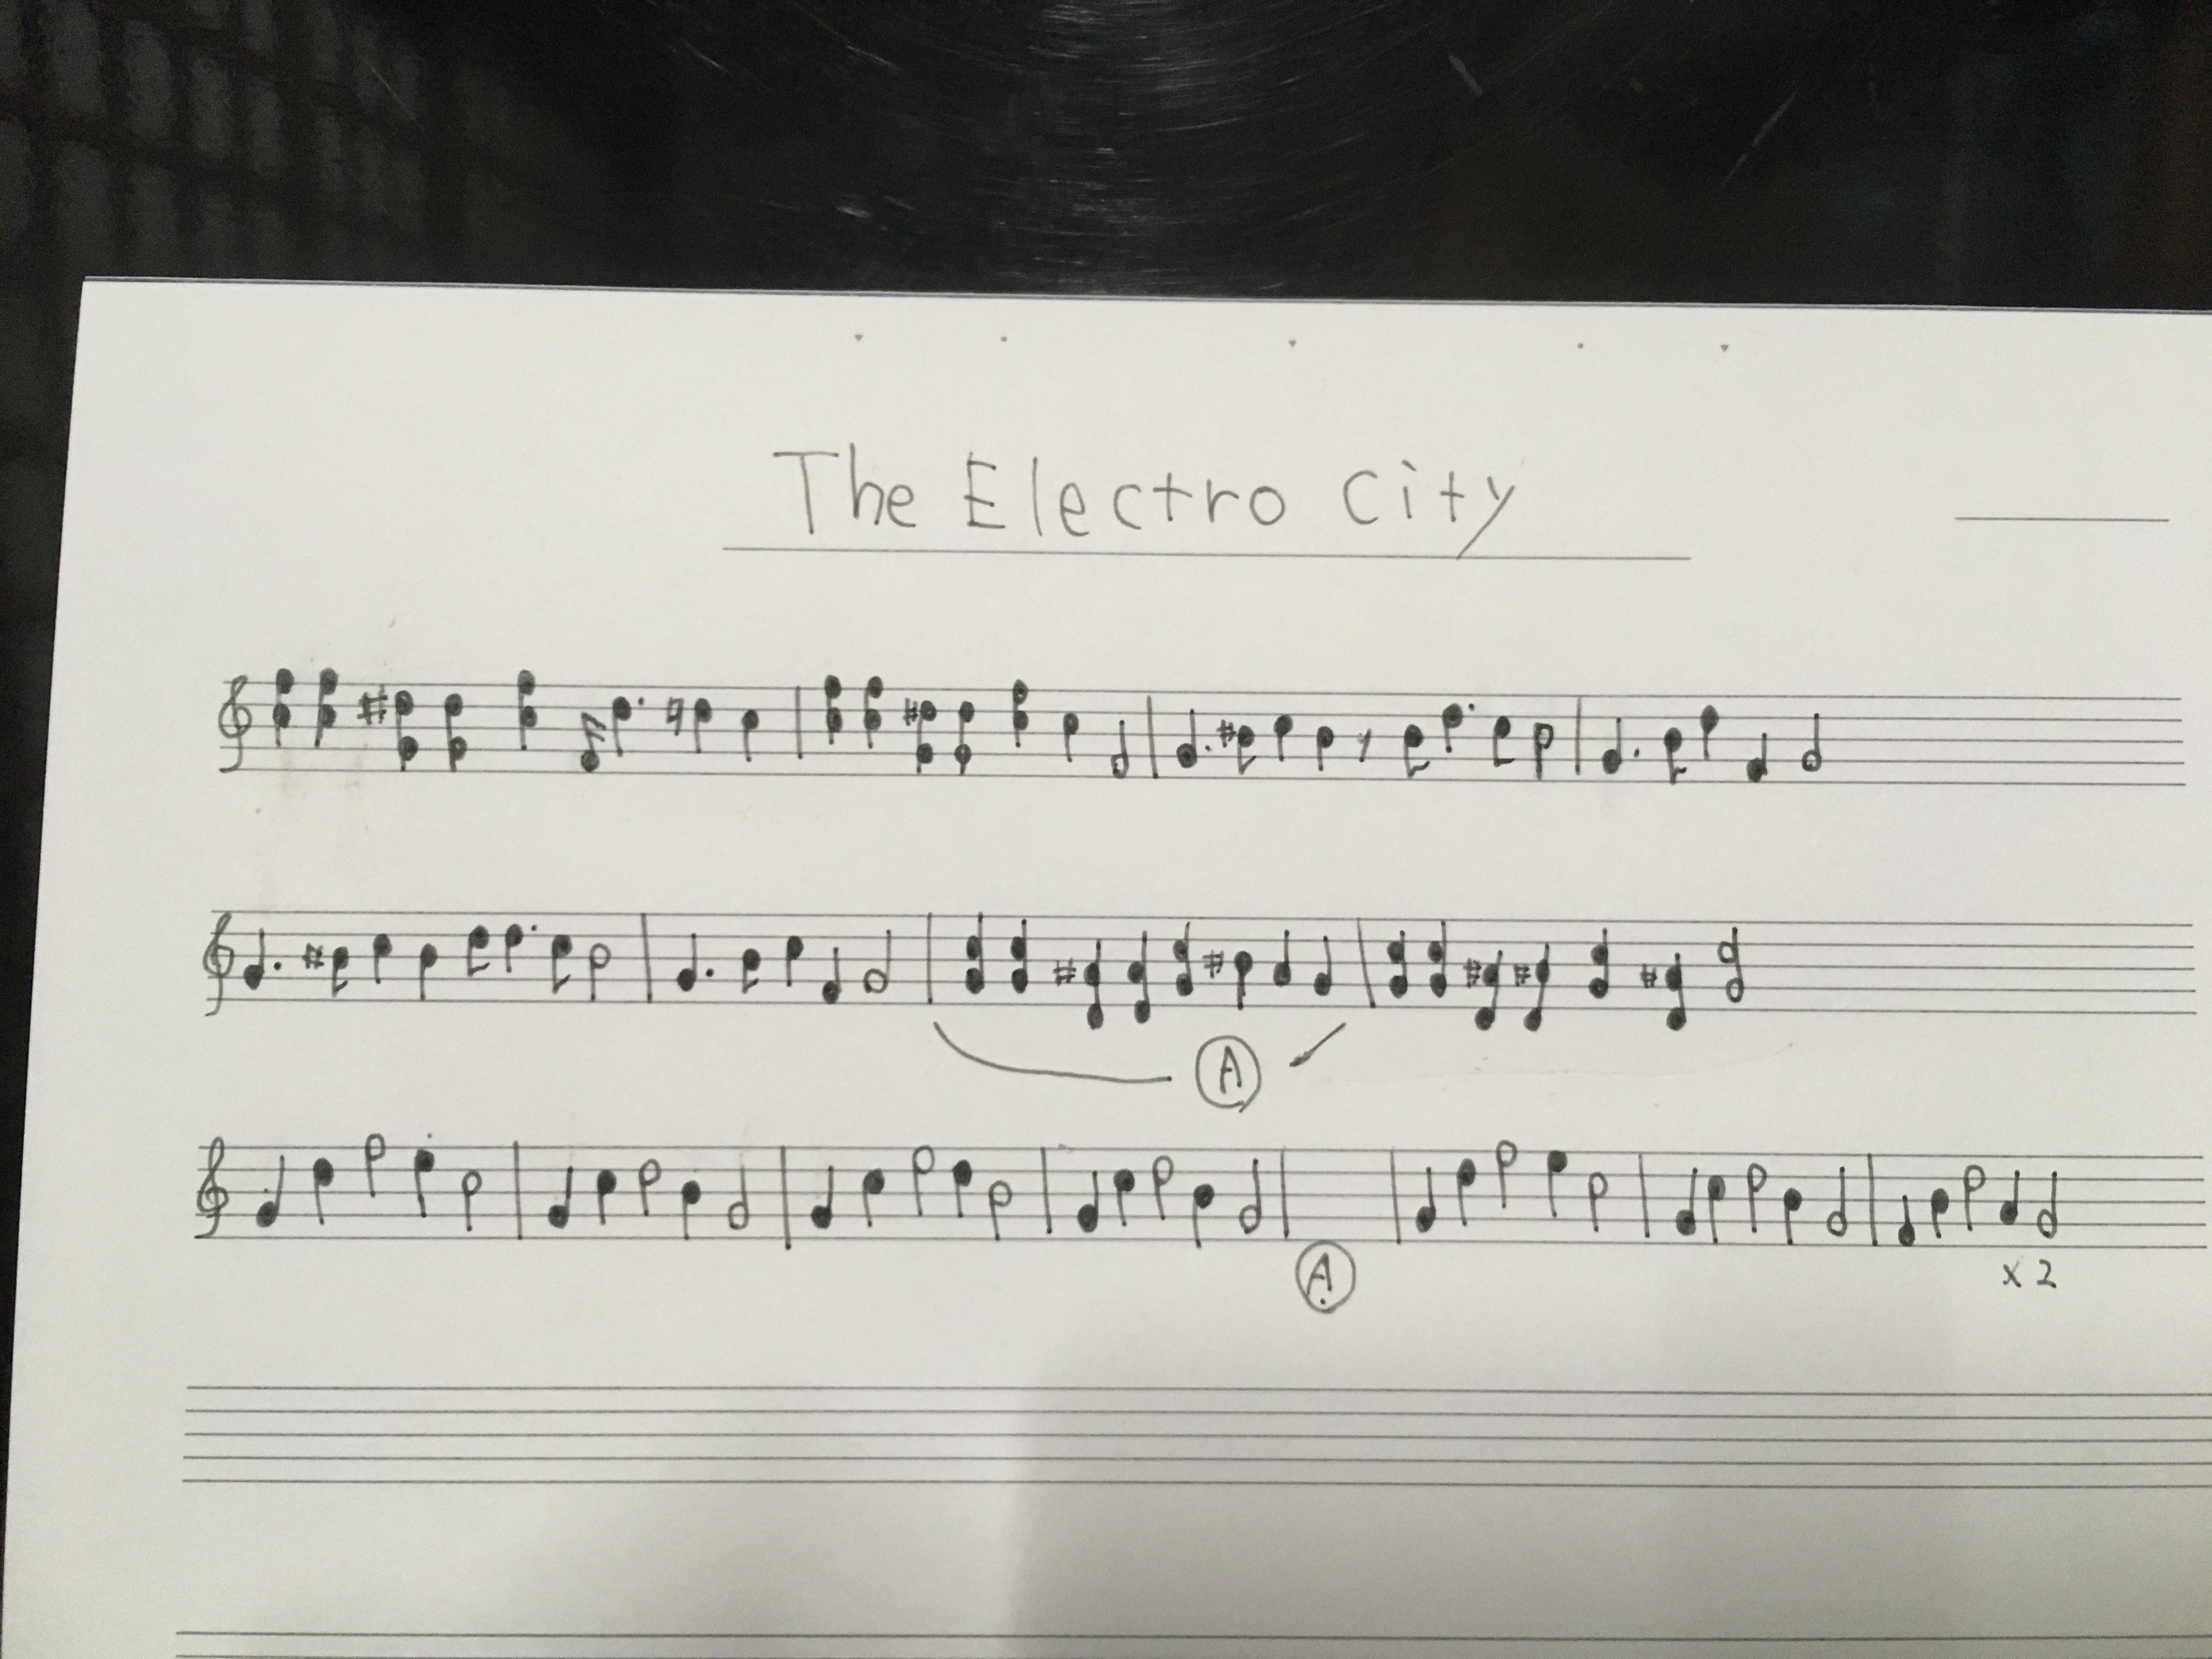 The Electro City